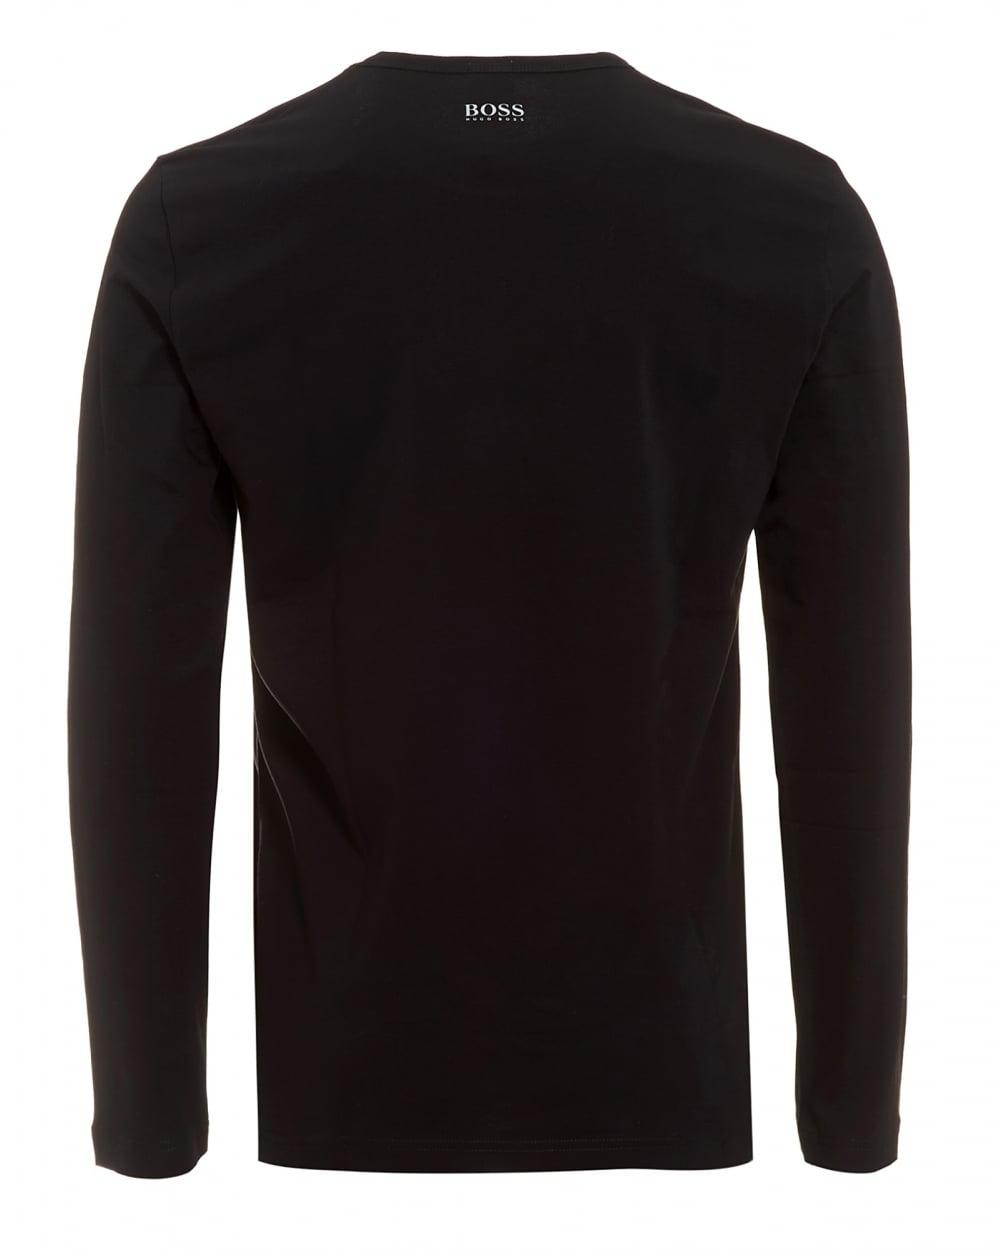 7dfdb5d2 Hugo Boss Green Mens Togn 1 T-Shirt, Black Long Sleeve Logo Tee